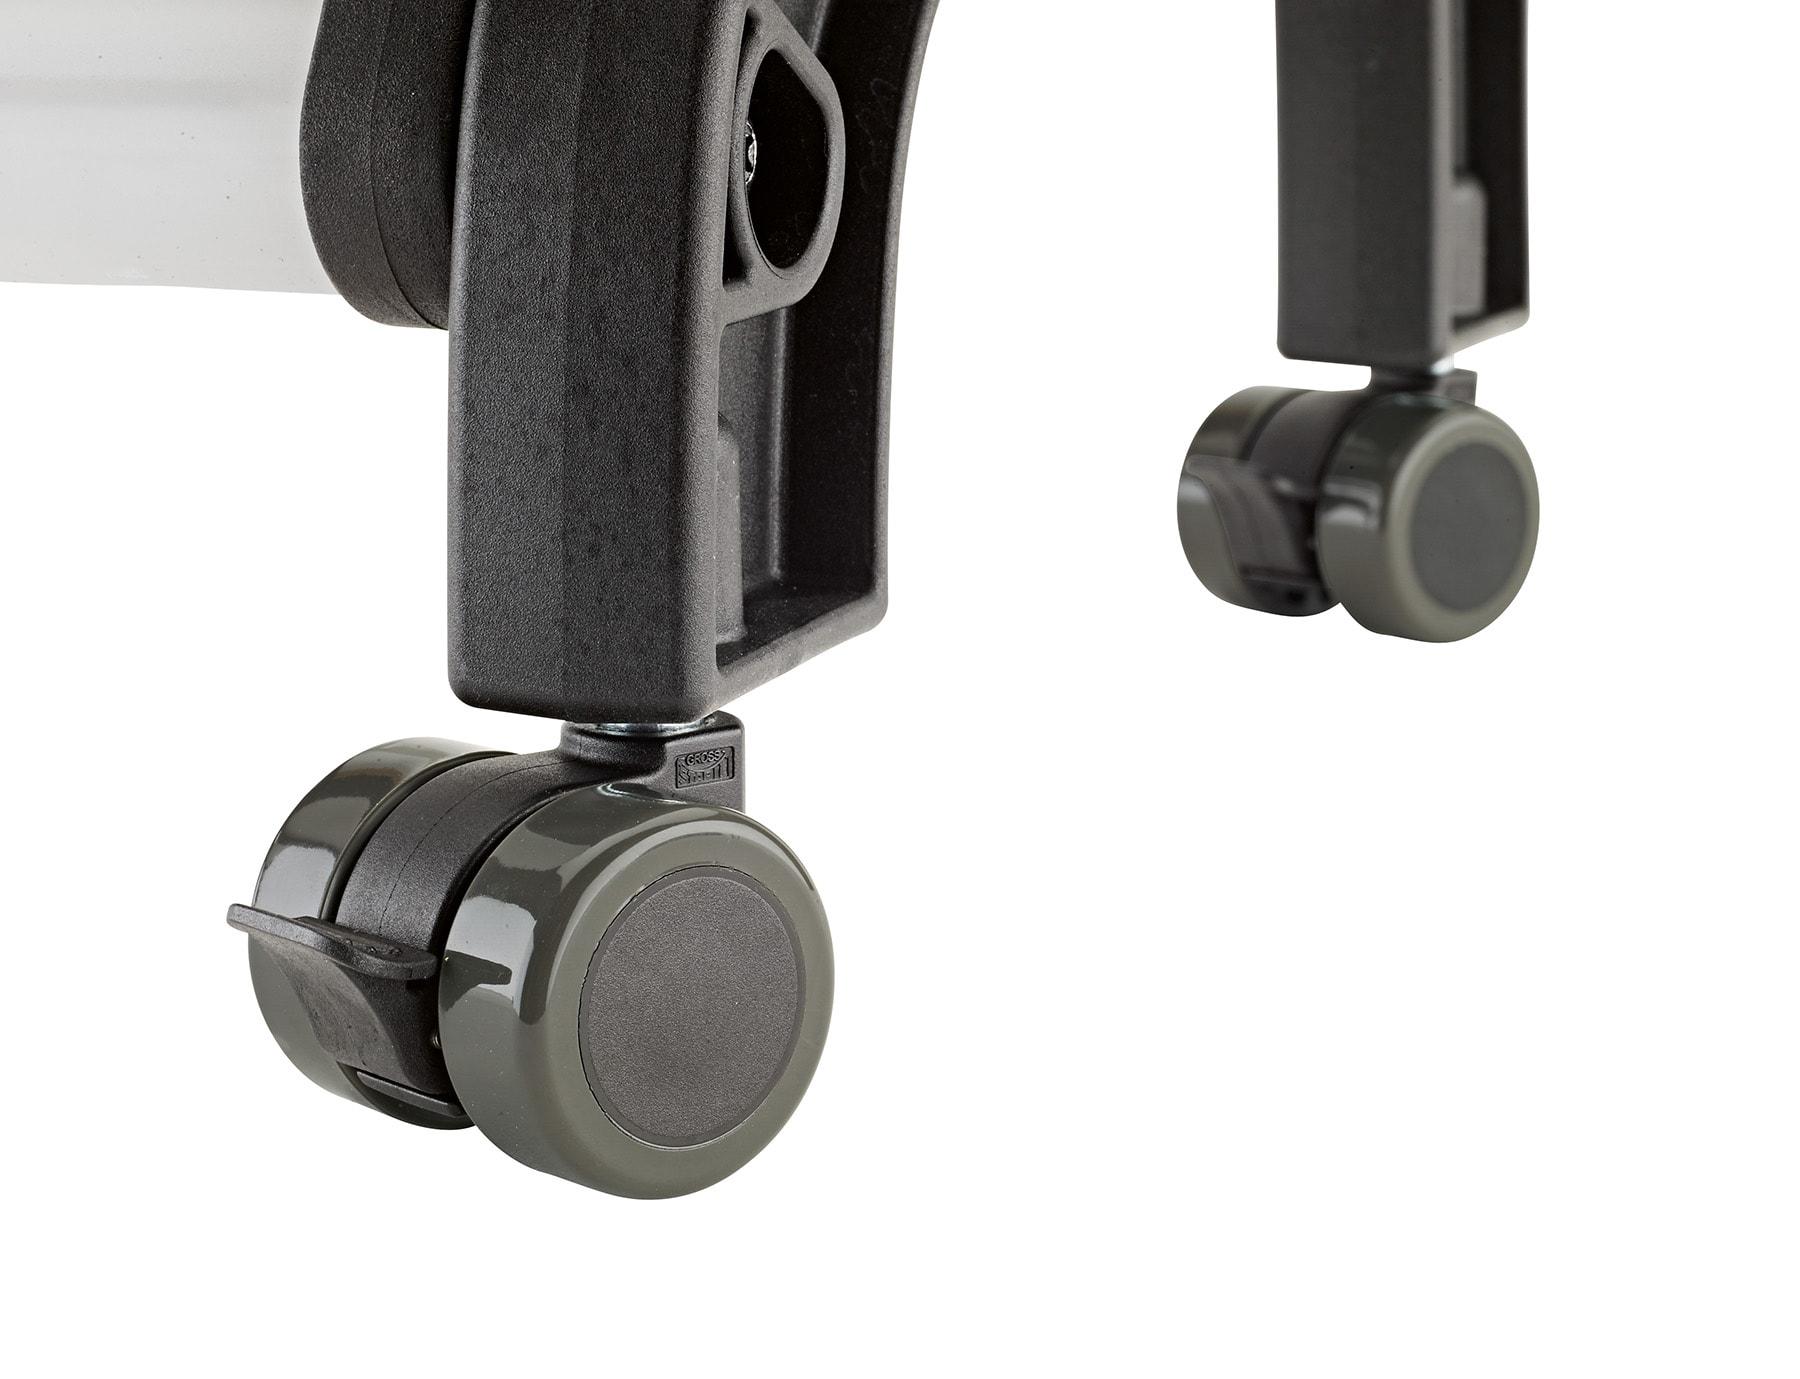 KM17510 - Caster set for »Guardian«